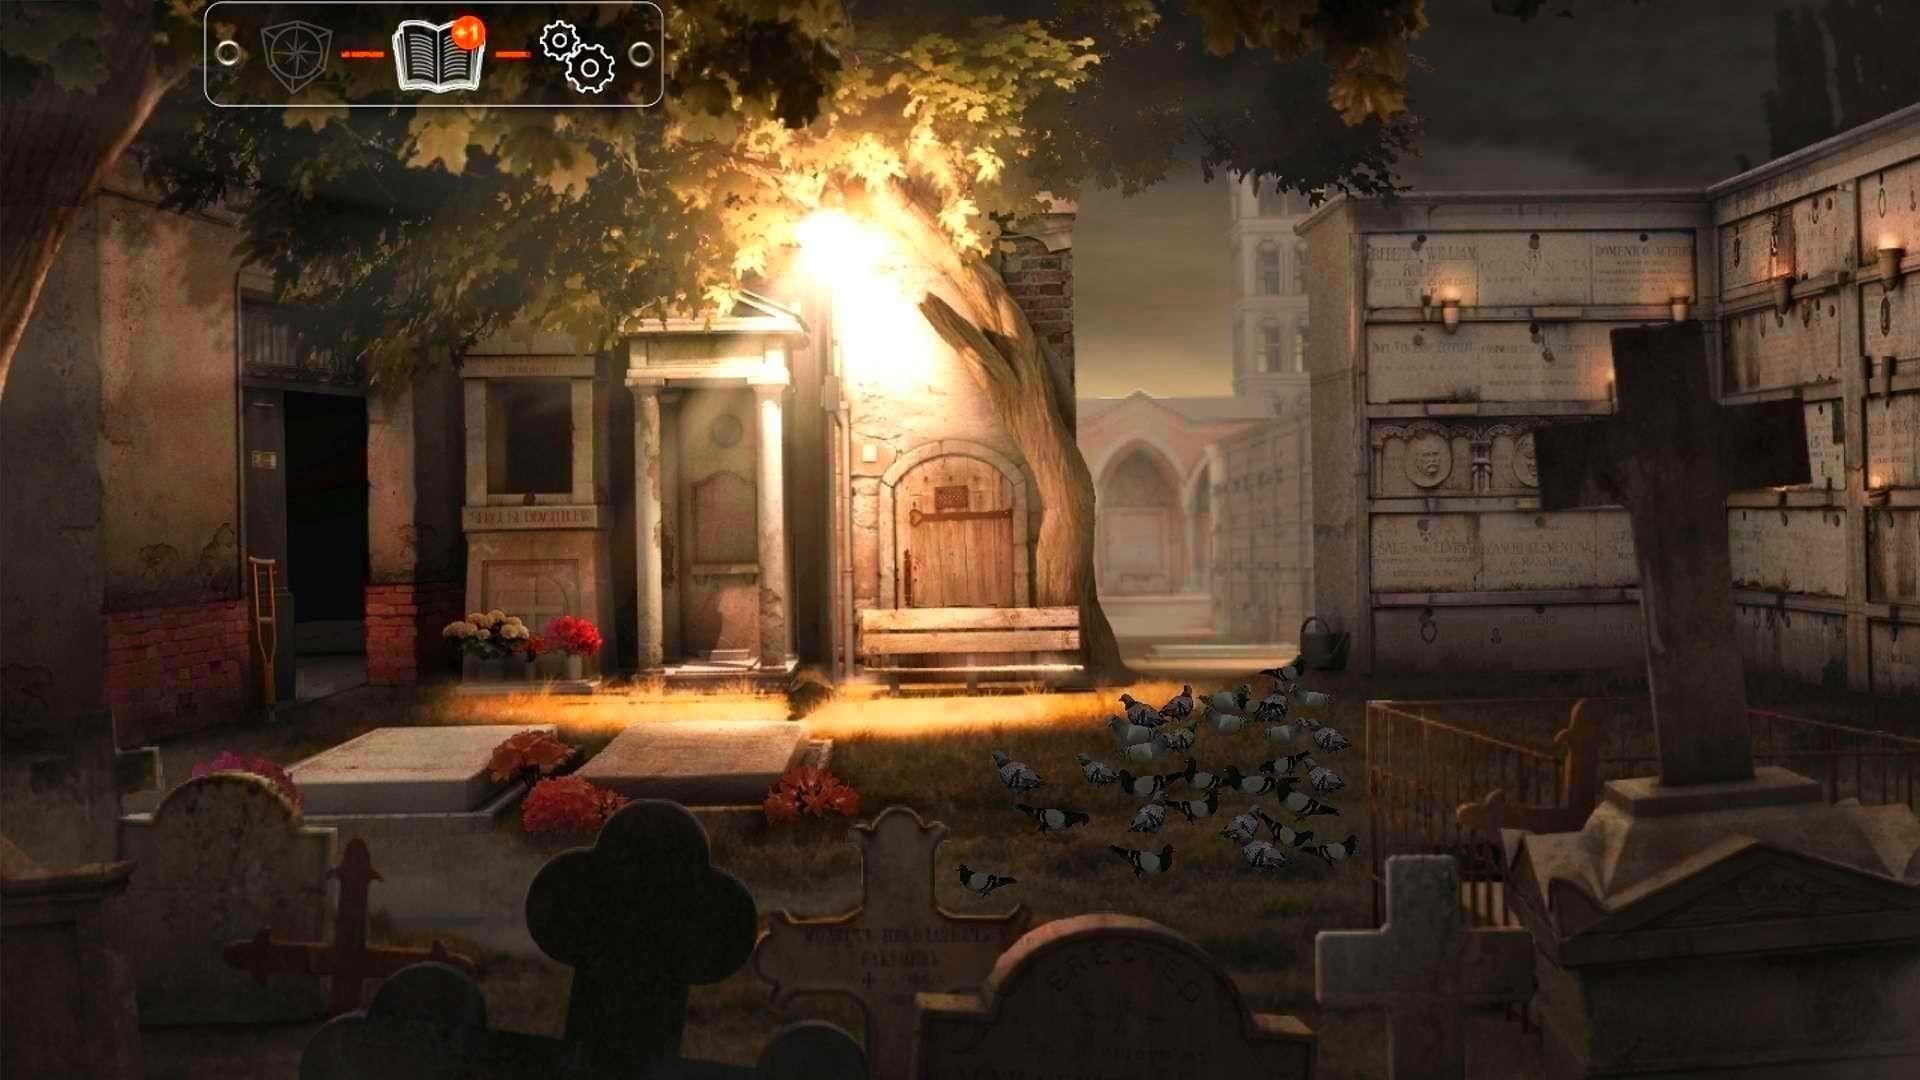 CortoMalteseScreenshot1.jpg